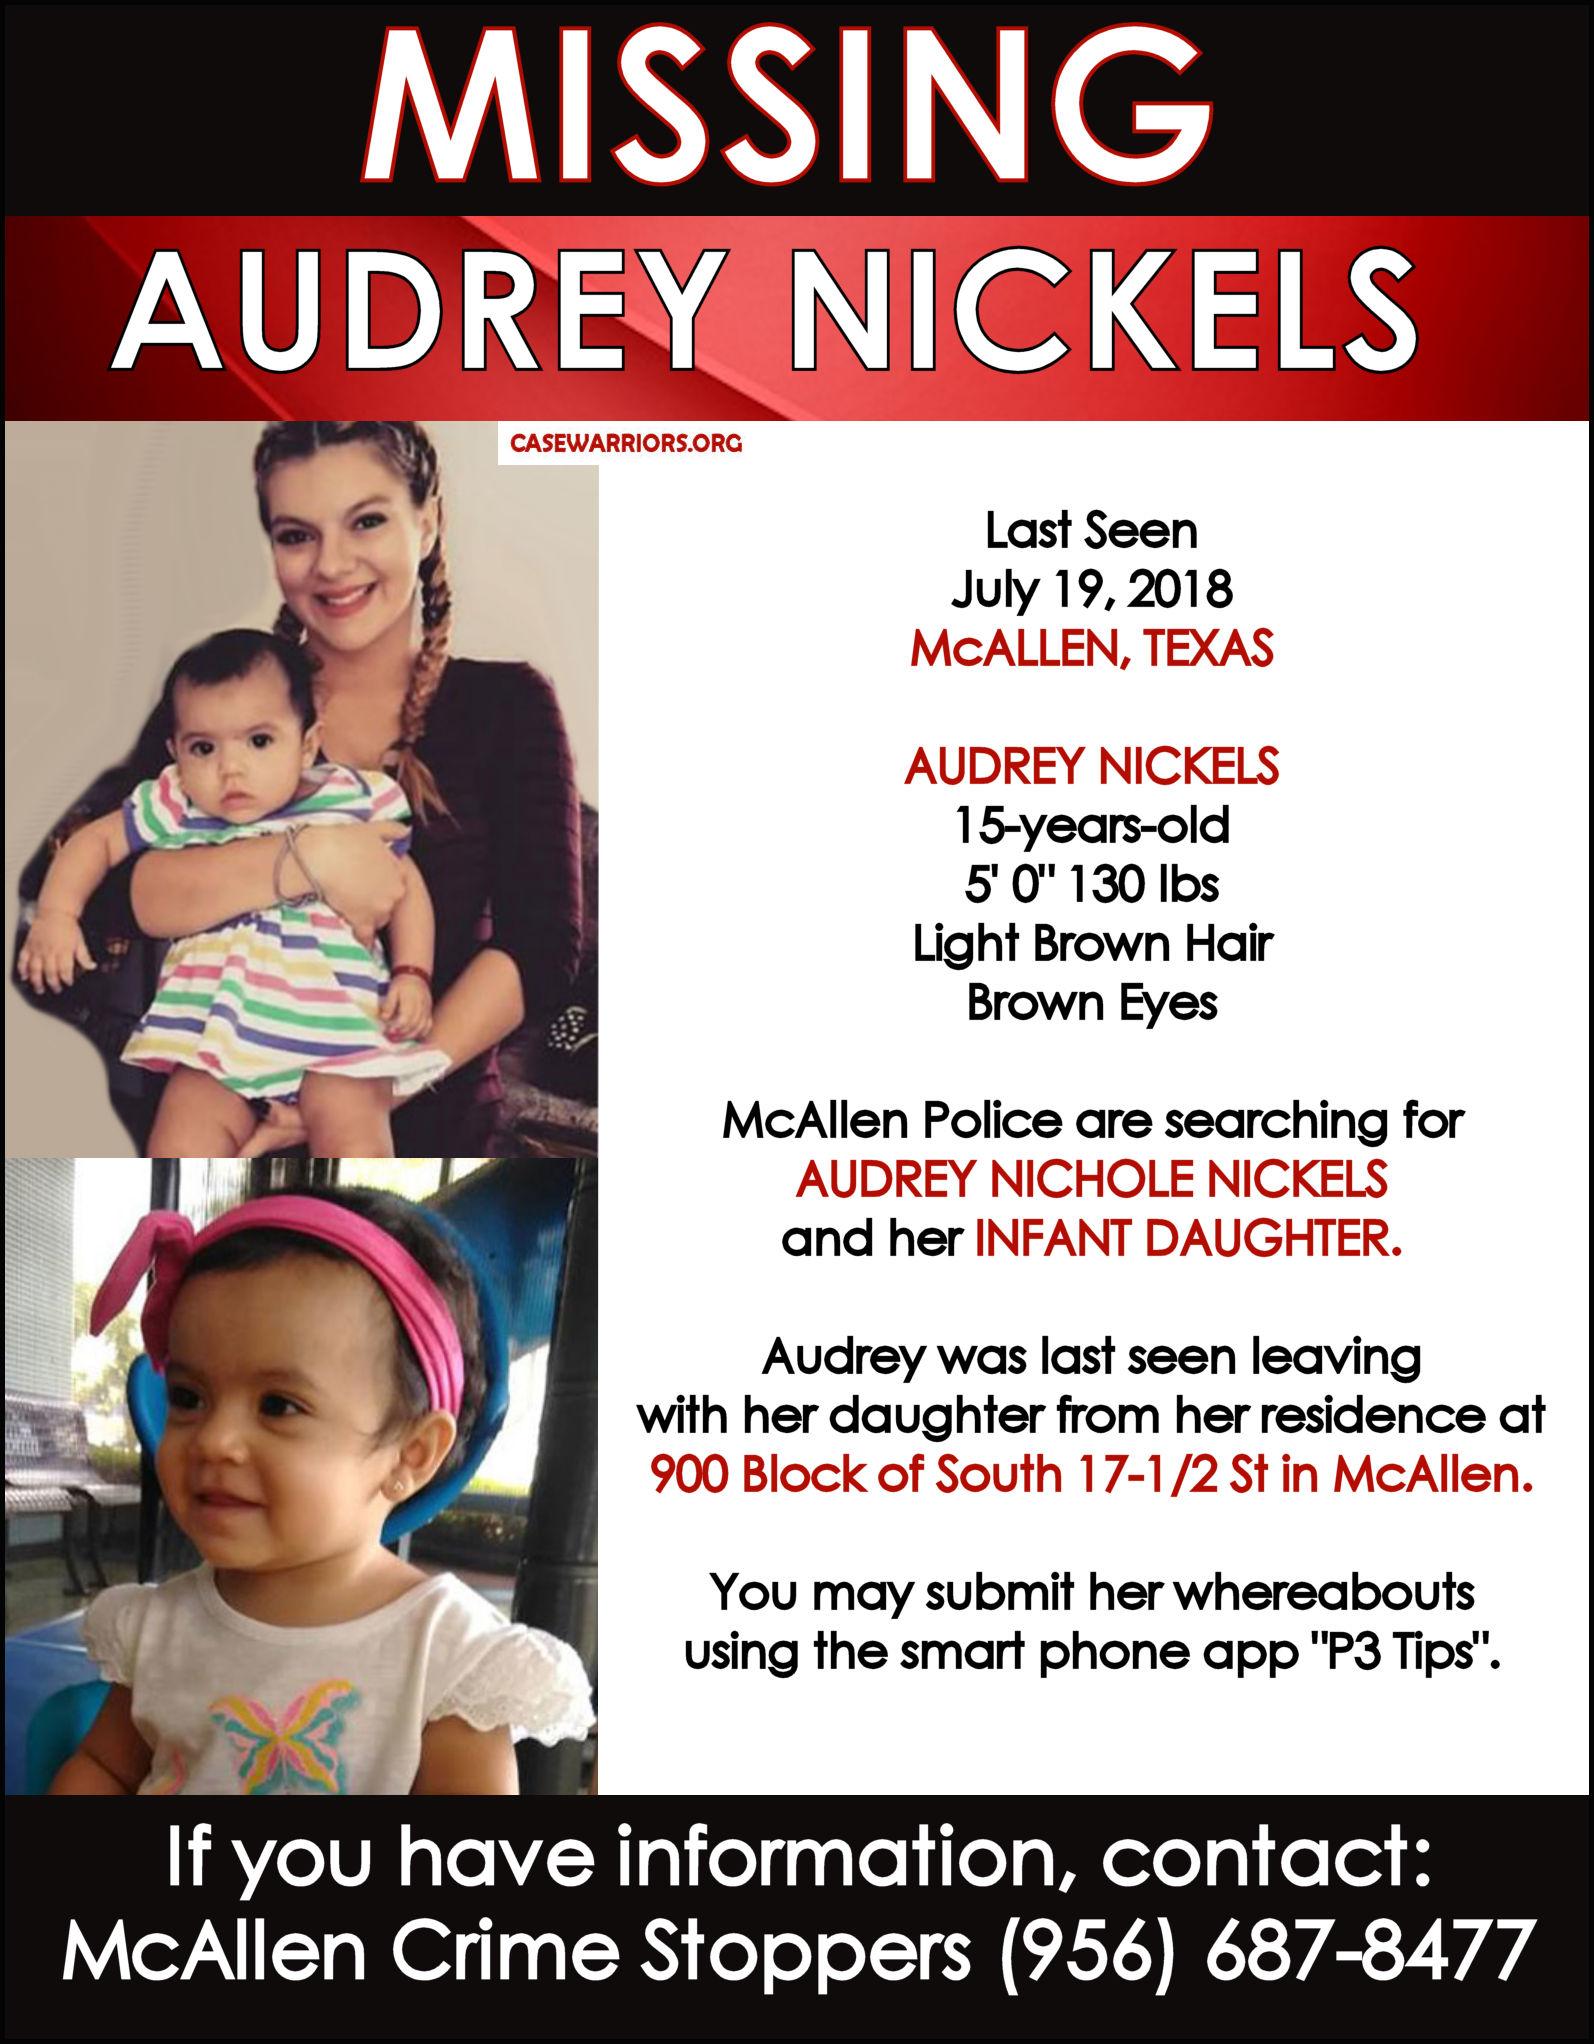 AUDREY NICKELS